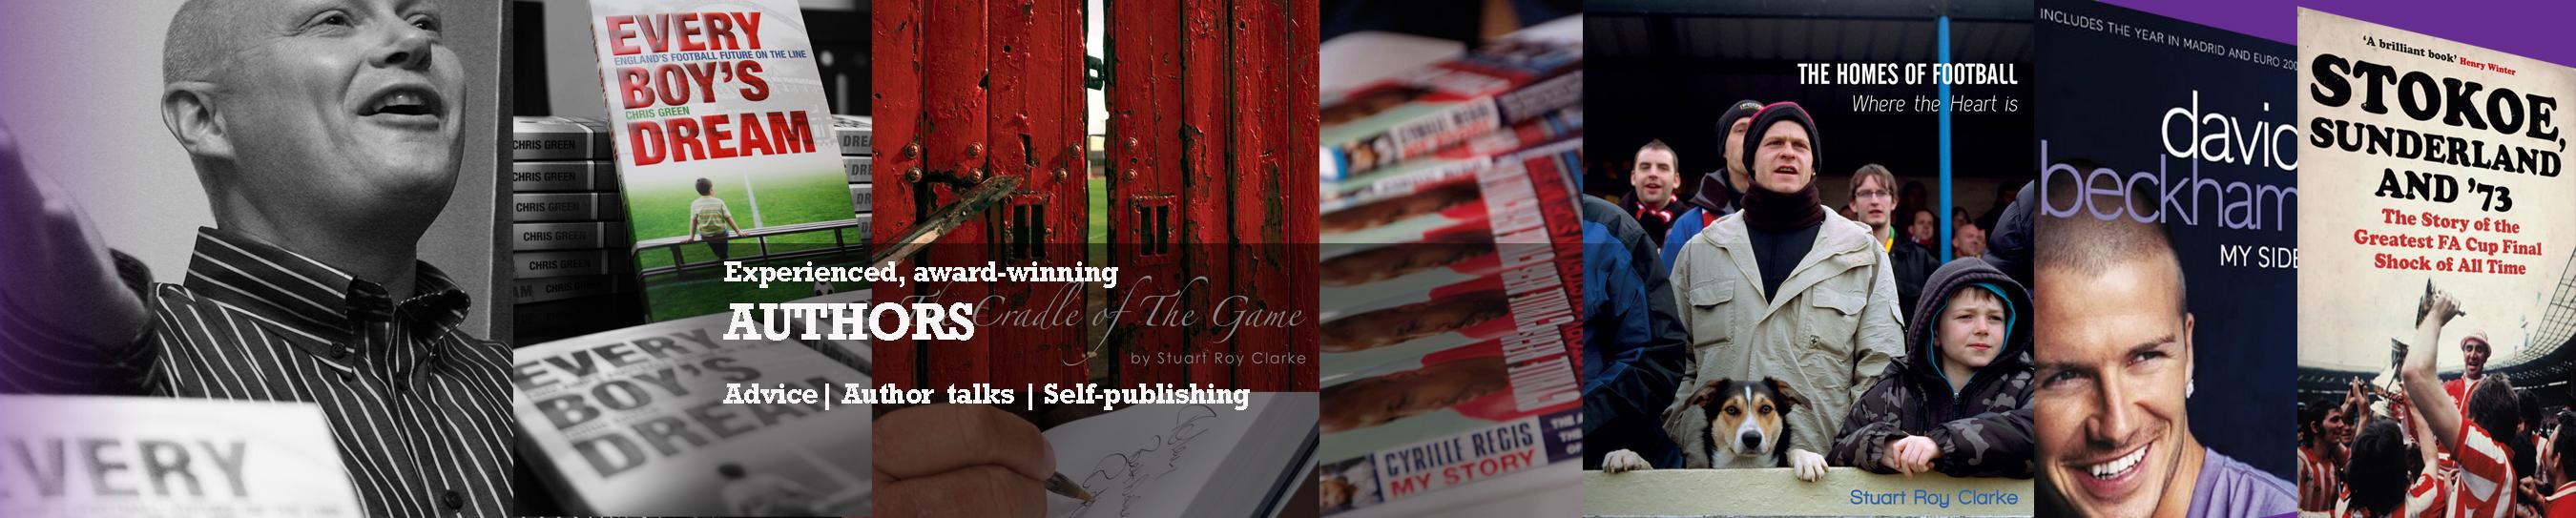 cgm-publishing-1